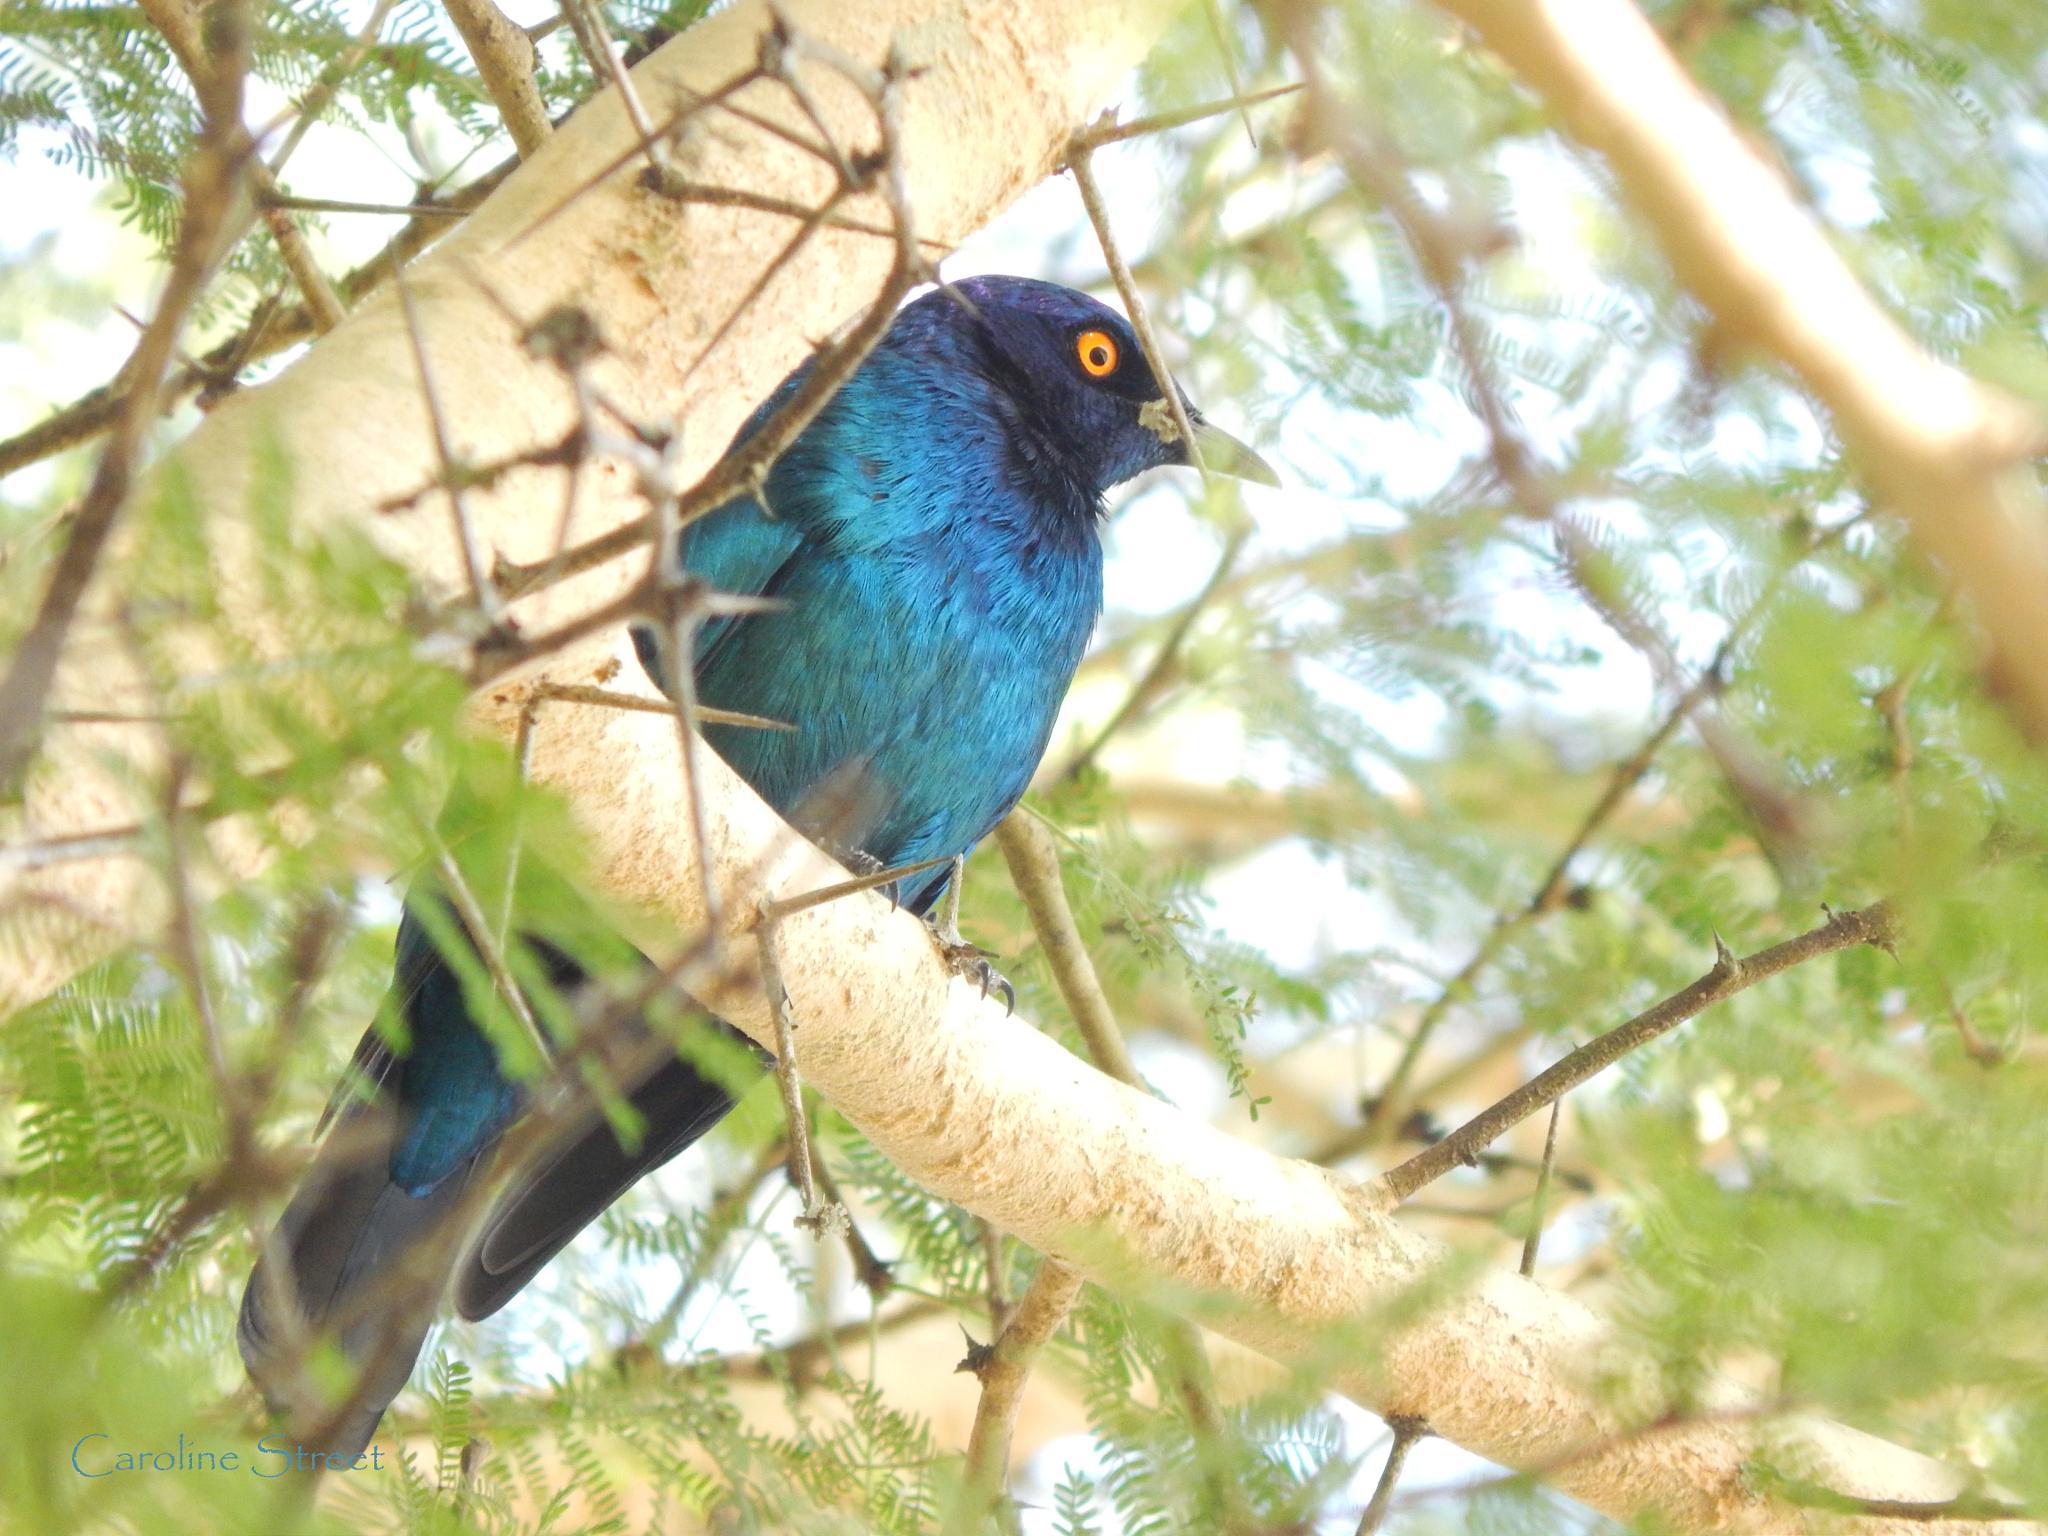 Blue Starling by Caroline Street